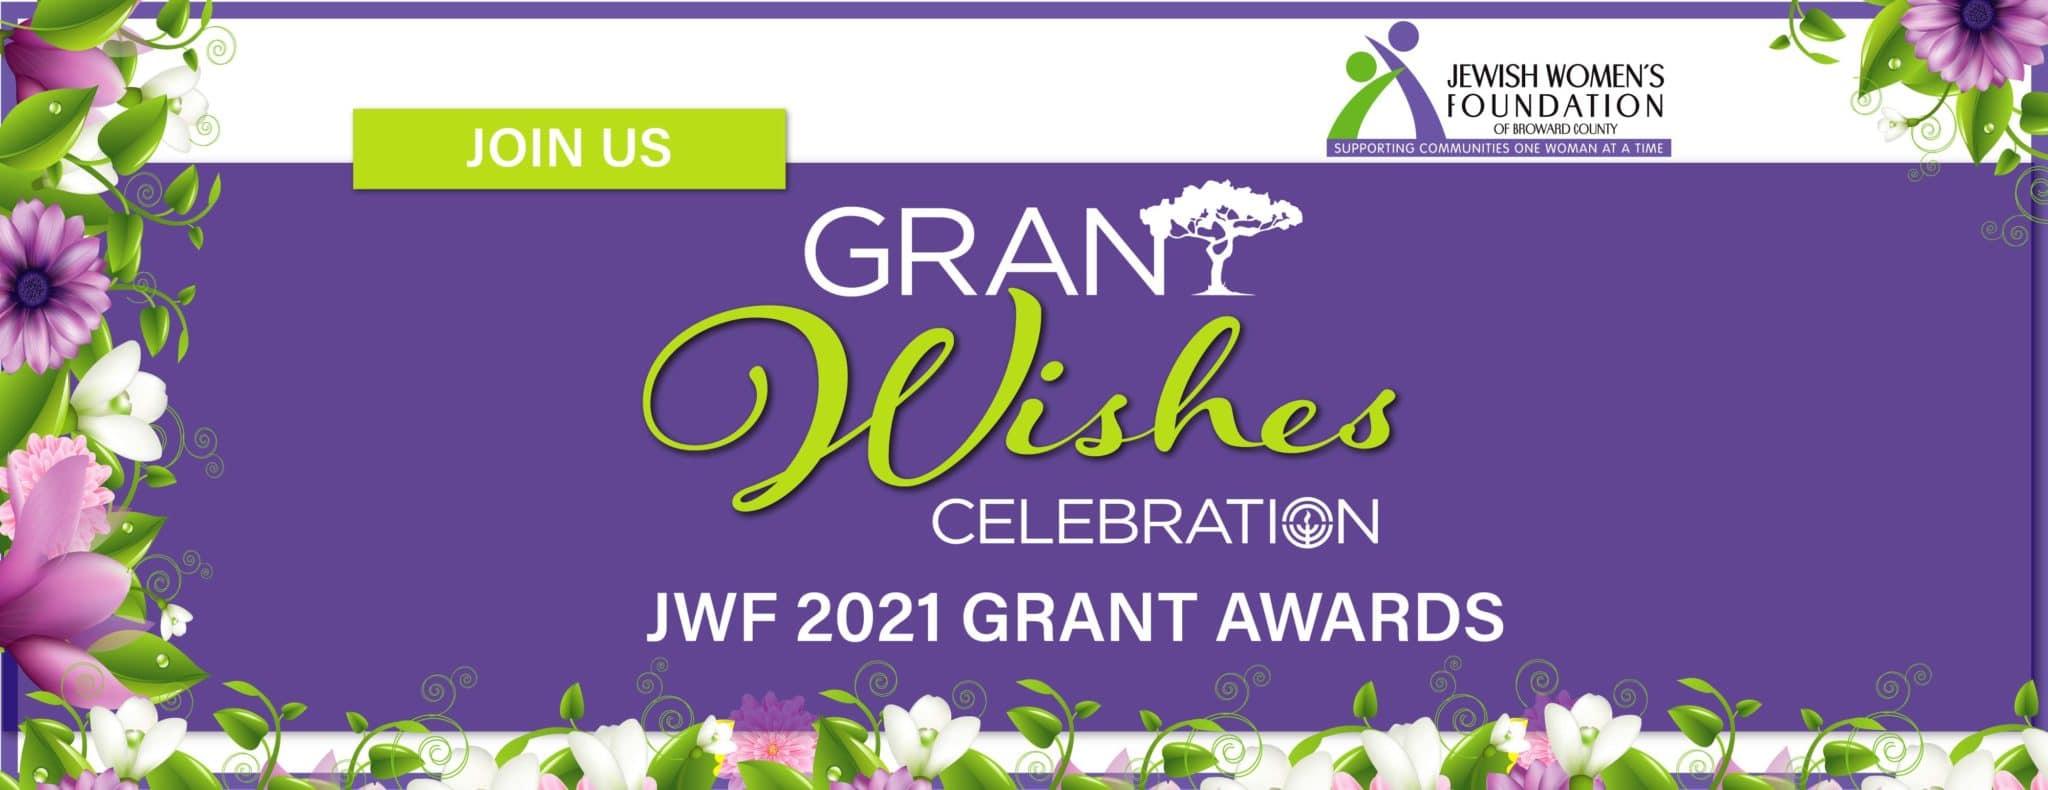 JWF Grant Wishes Registration